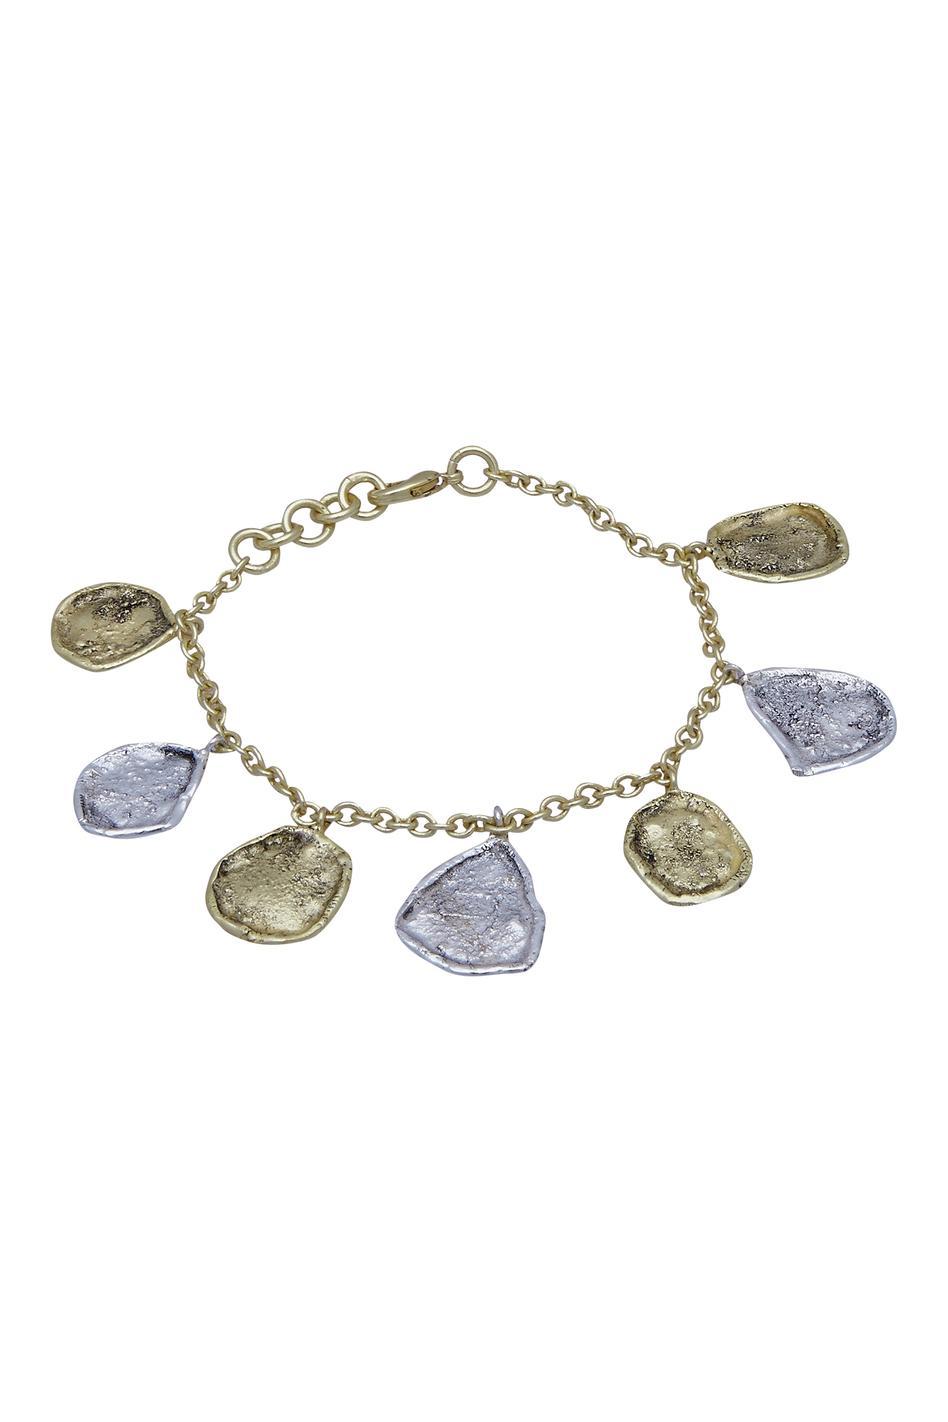 Dual tone chain bracelet